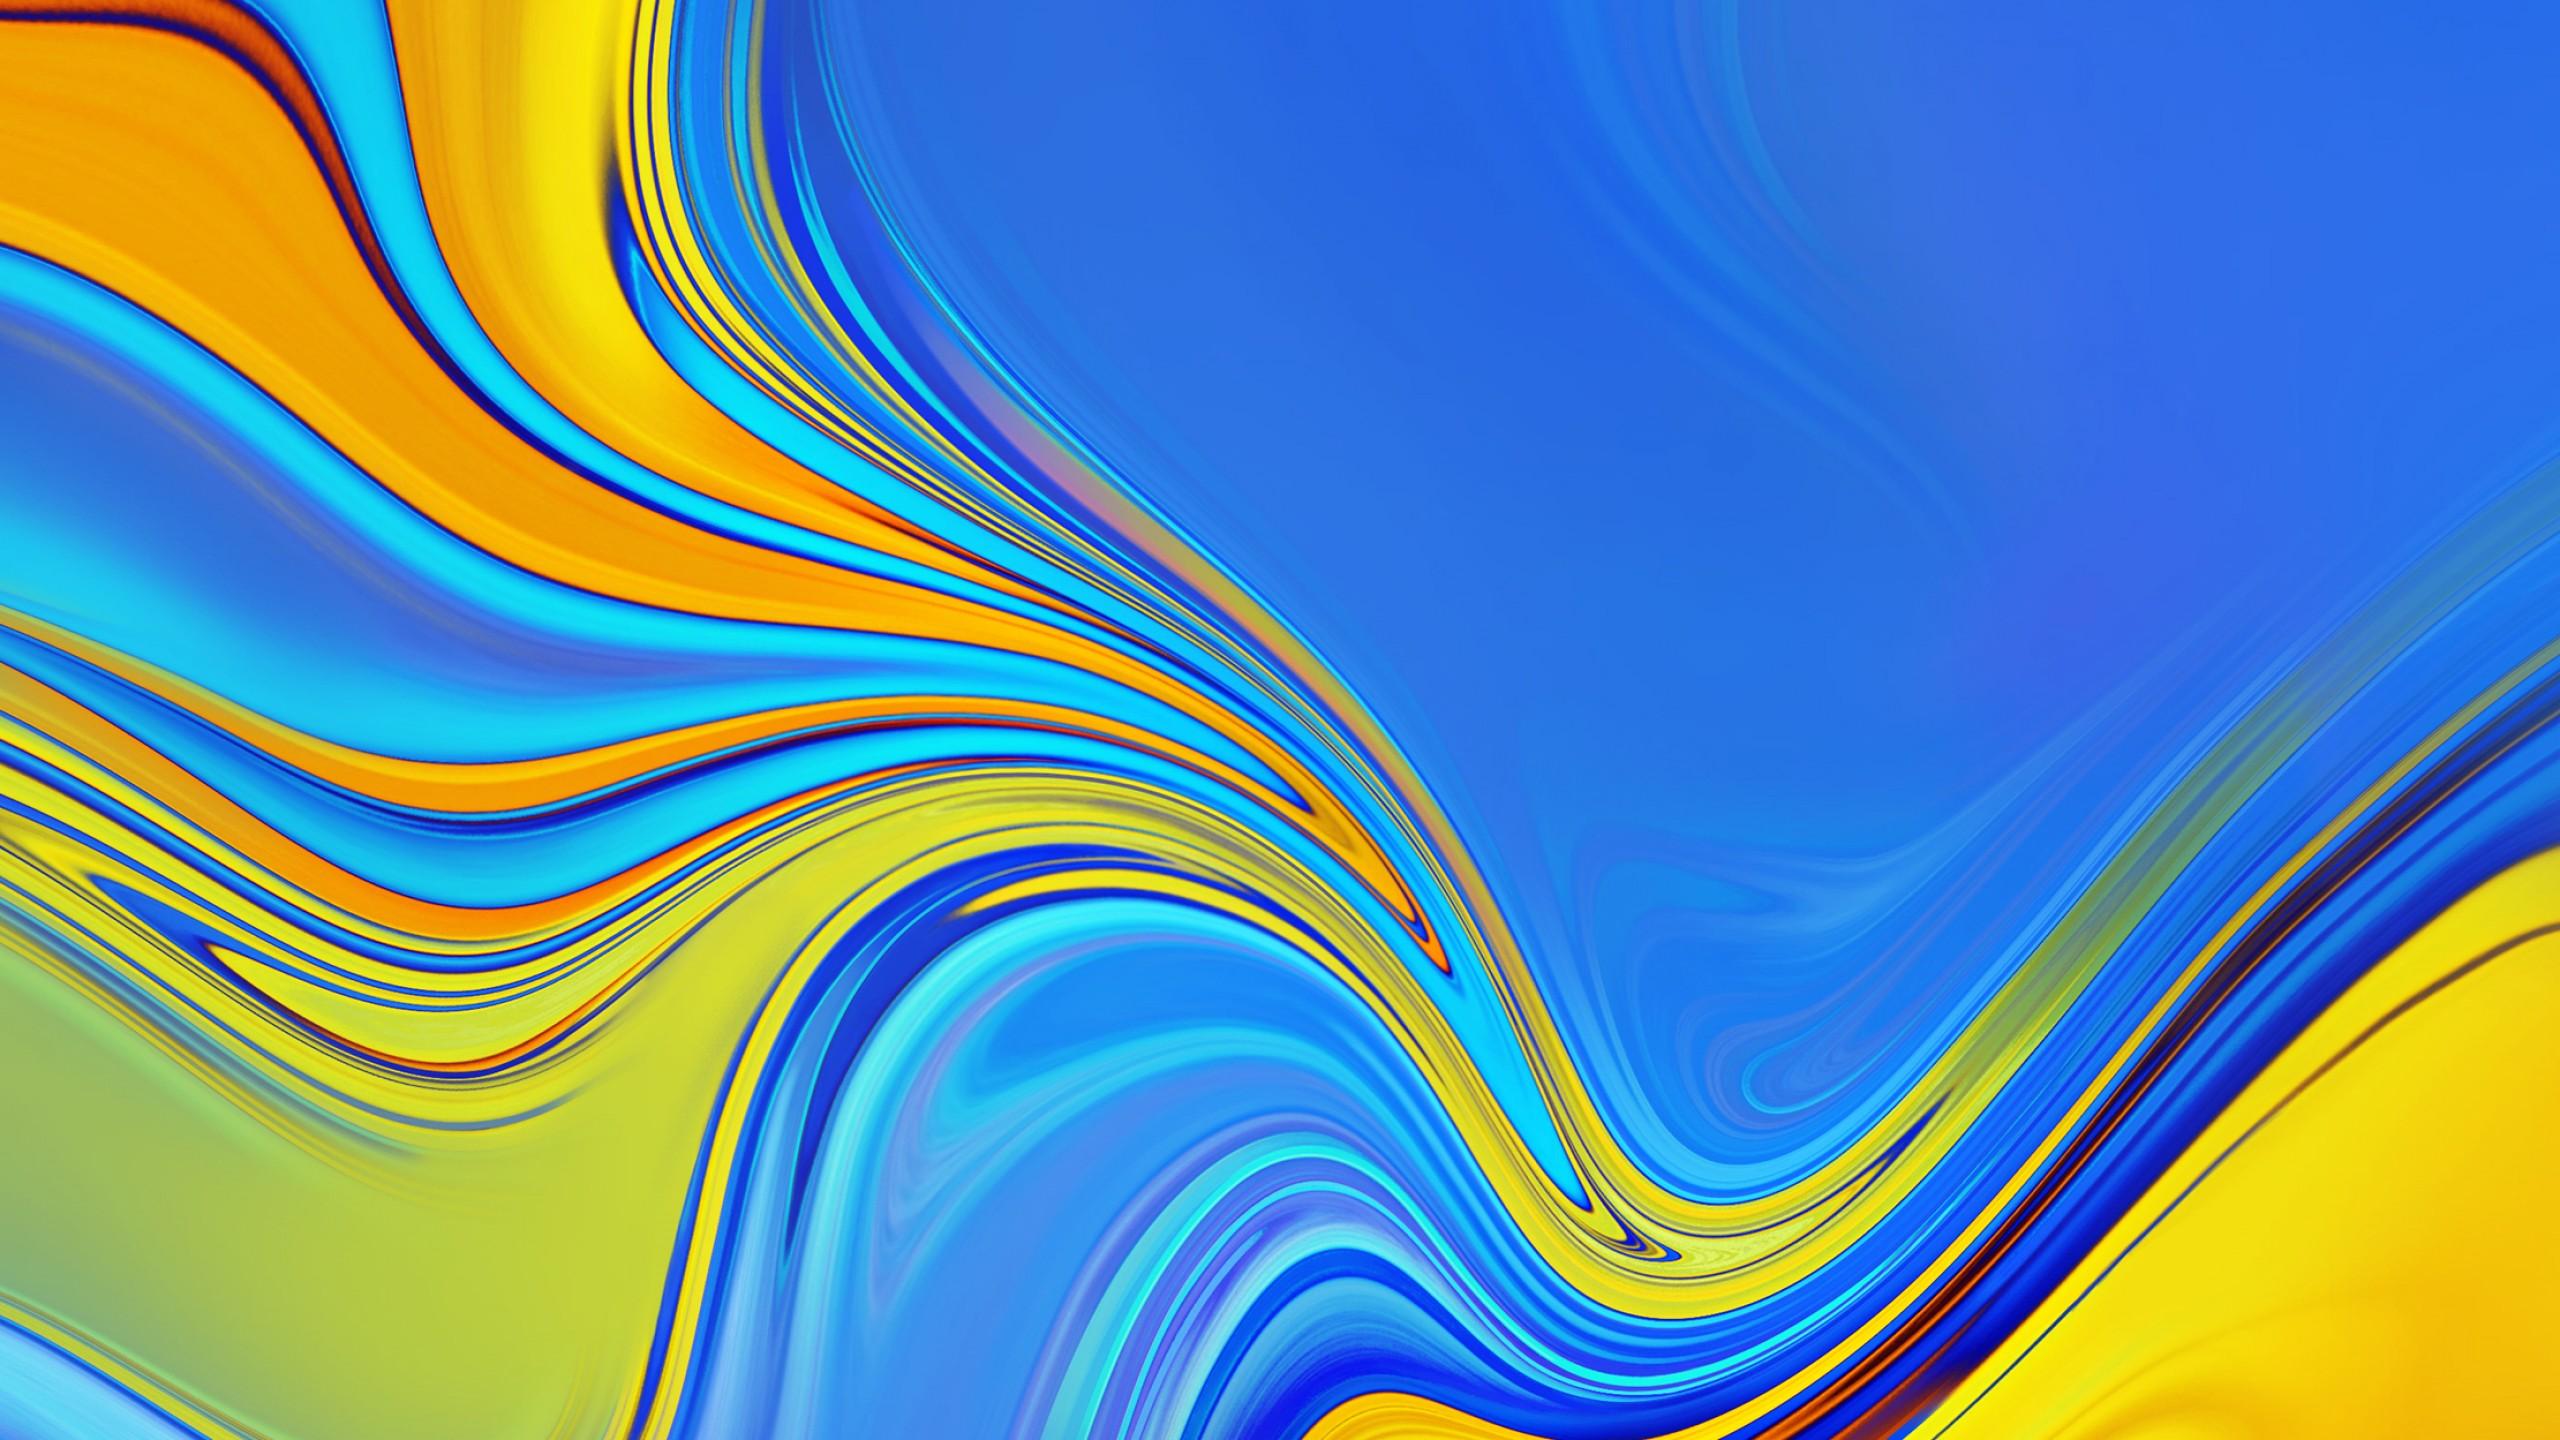 Wallpaper Samsung Galaxy A9 Samsung Galaxy A7 Android 80 2560x1440